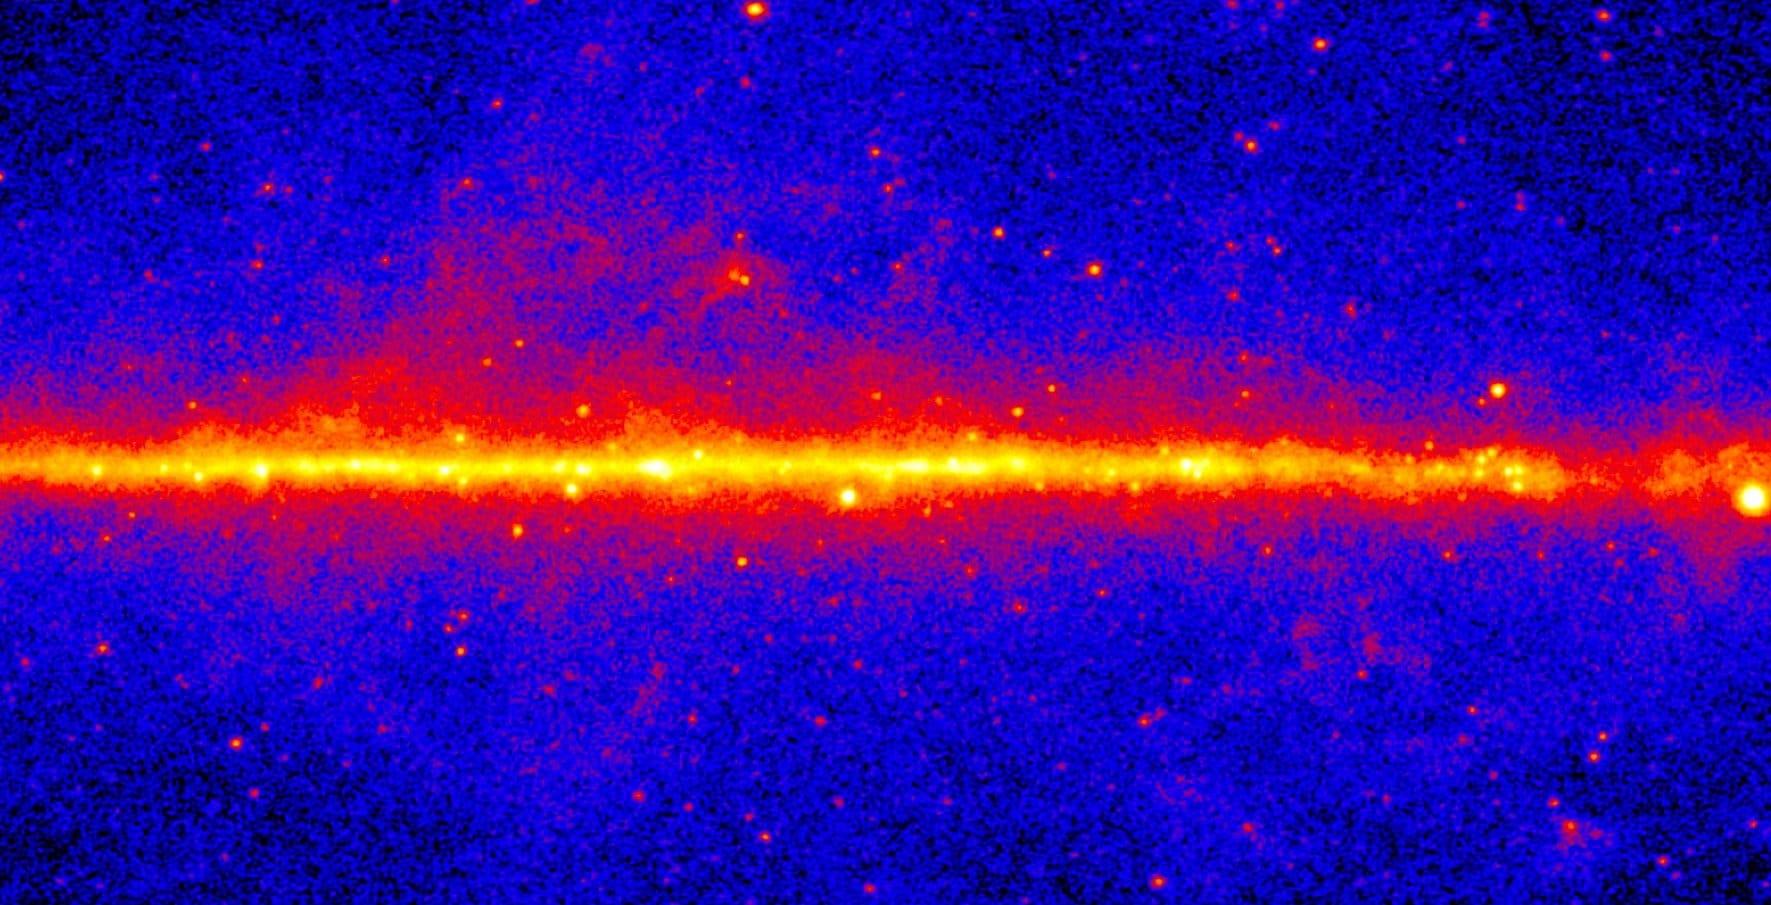 Gleamoscope/Fermi Telescope